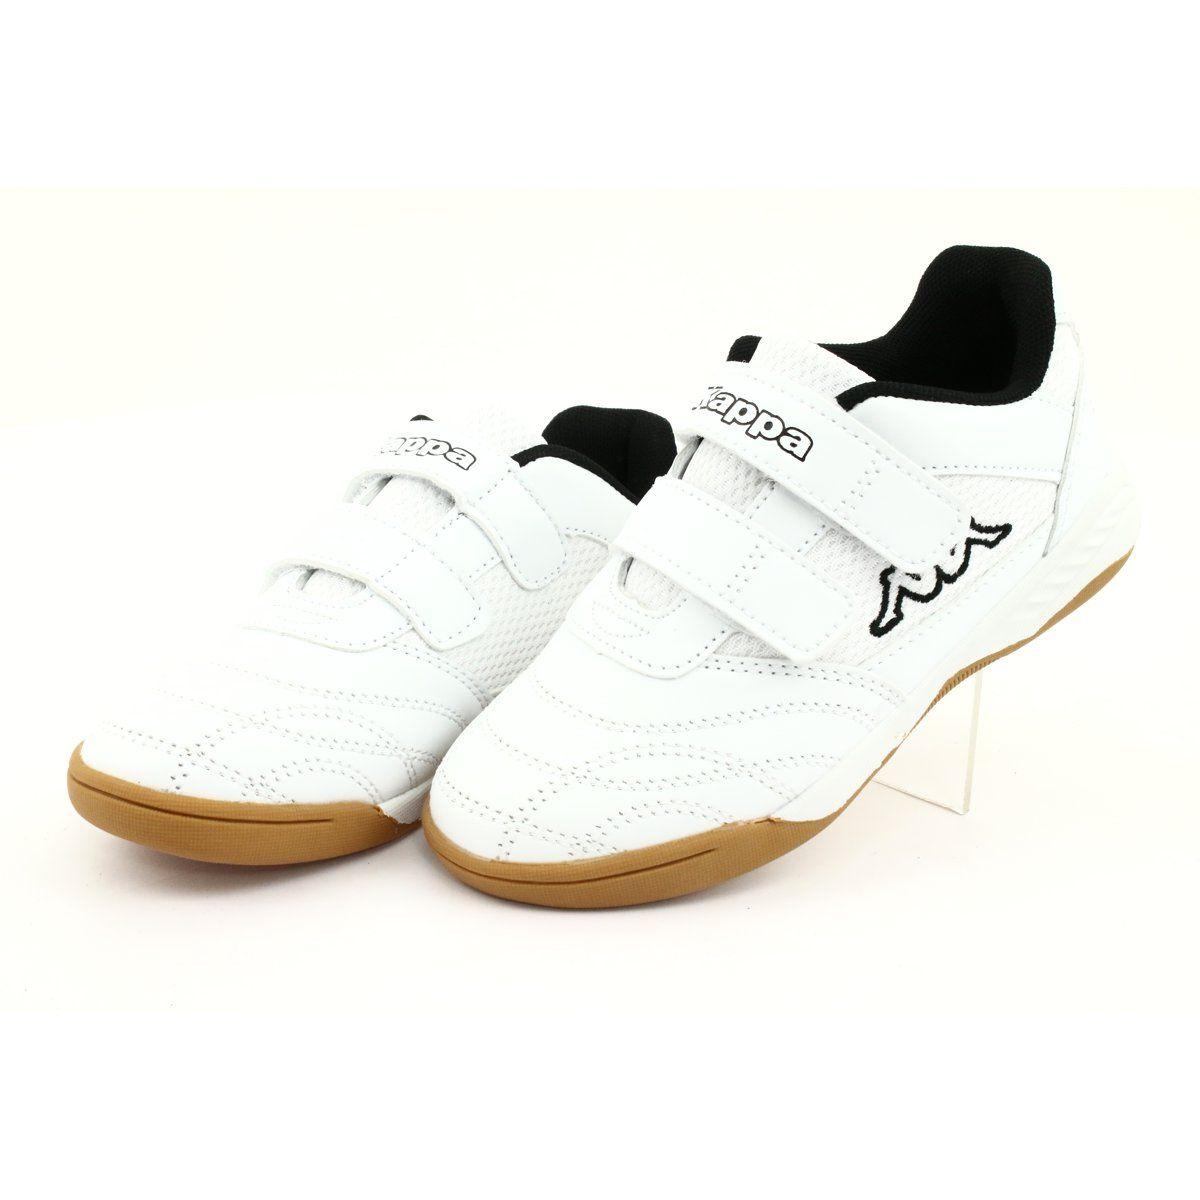 Kappa Kickoff Jr 260509k 1011 Shoes White Black Kid Shoes Shoes Indoor Shoe